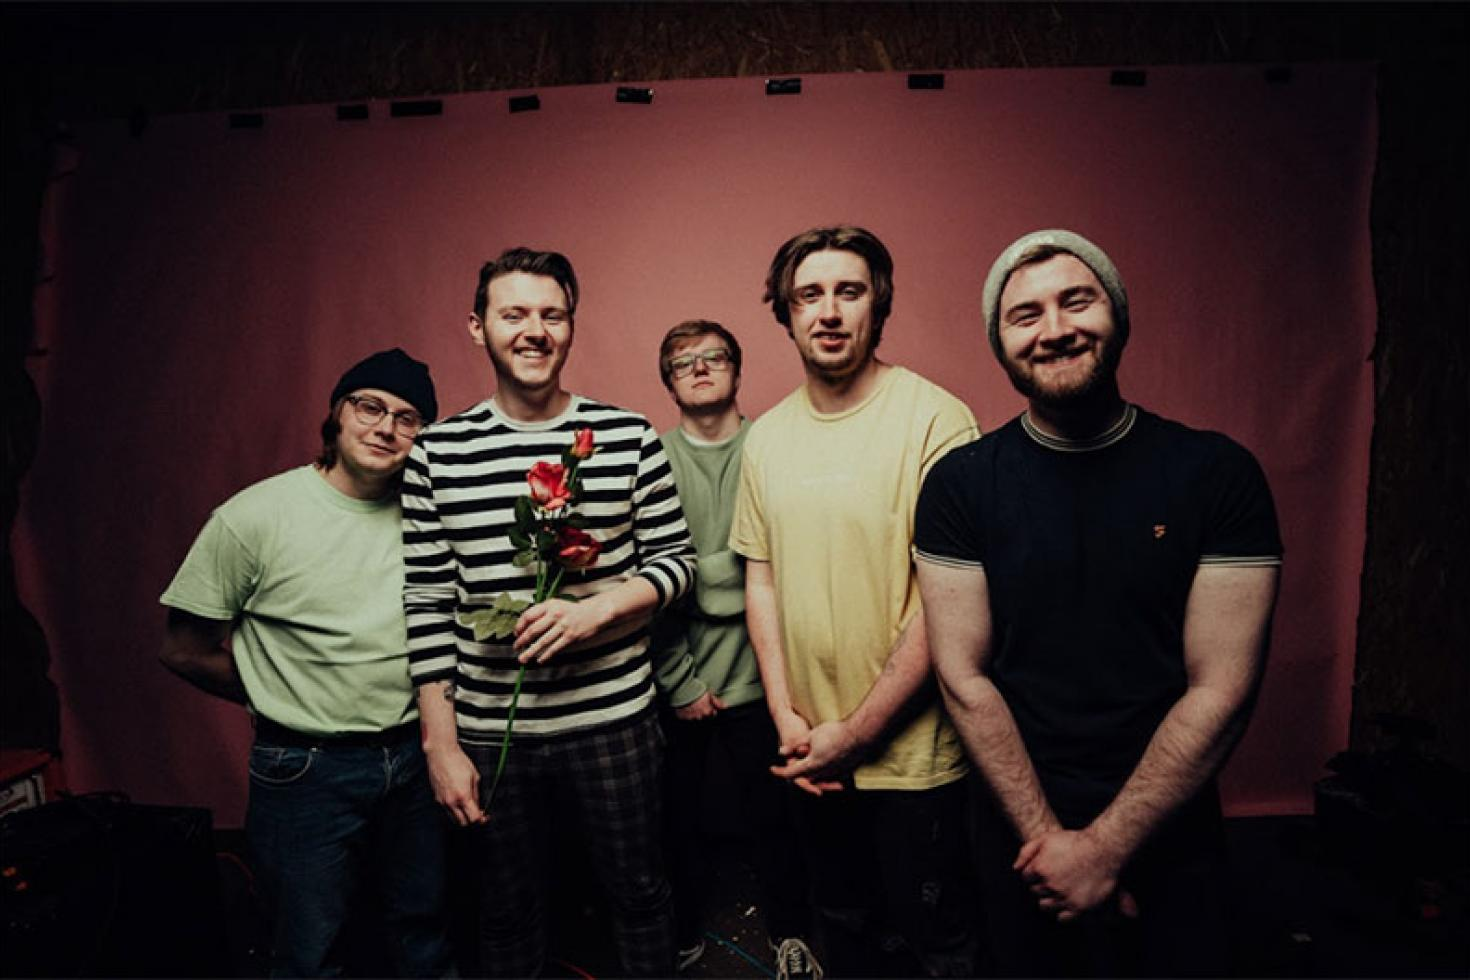 Glasgow's poppunks WRTHLESS drop video for new single 'Dislike'